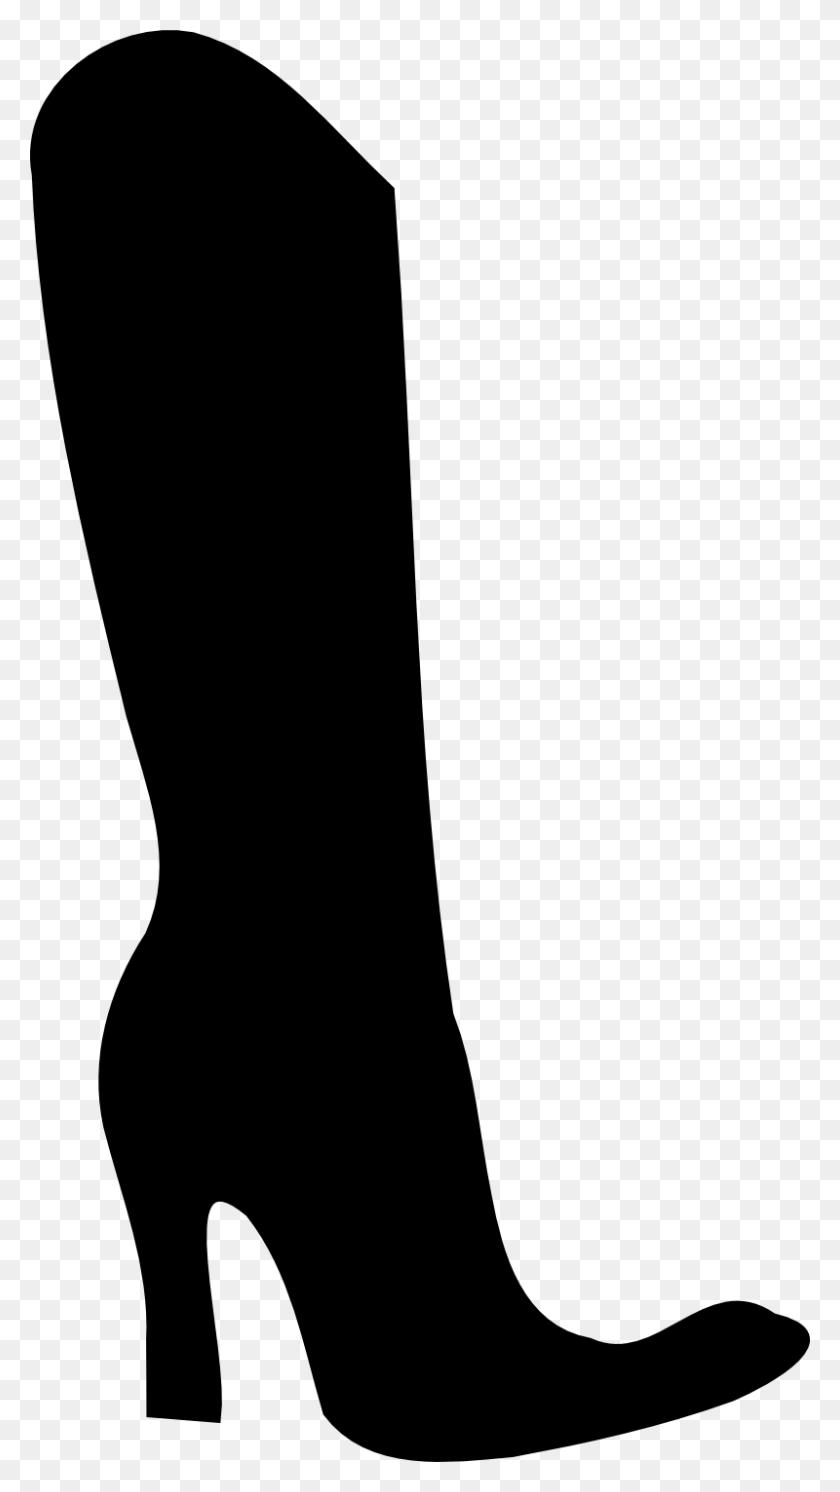 Shoe Silhouette Clip Art Shoe Silhouette - High Heel Shoe Clipart